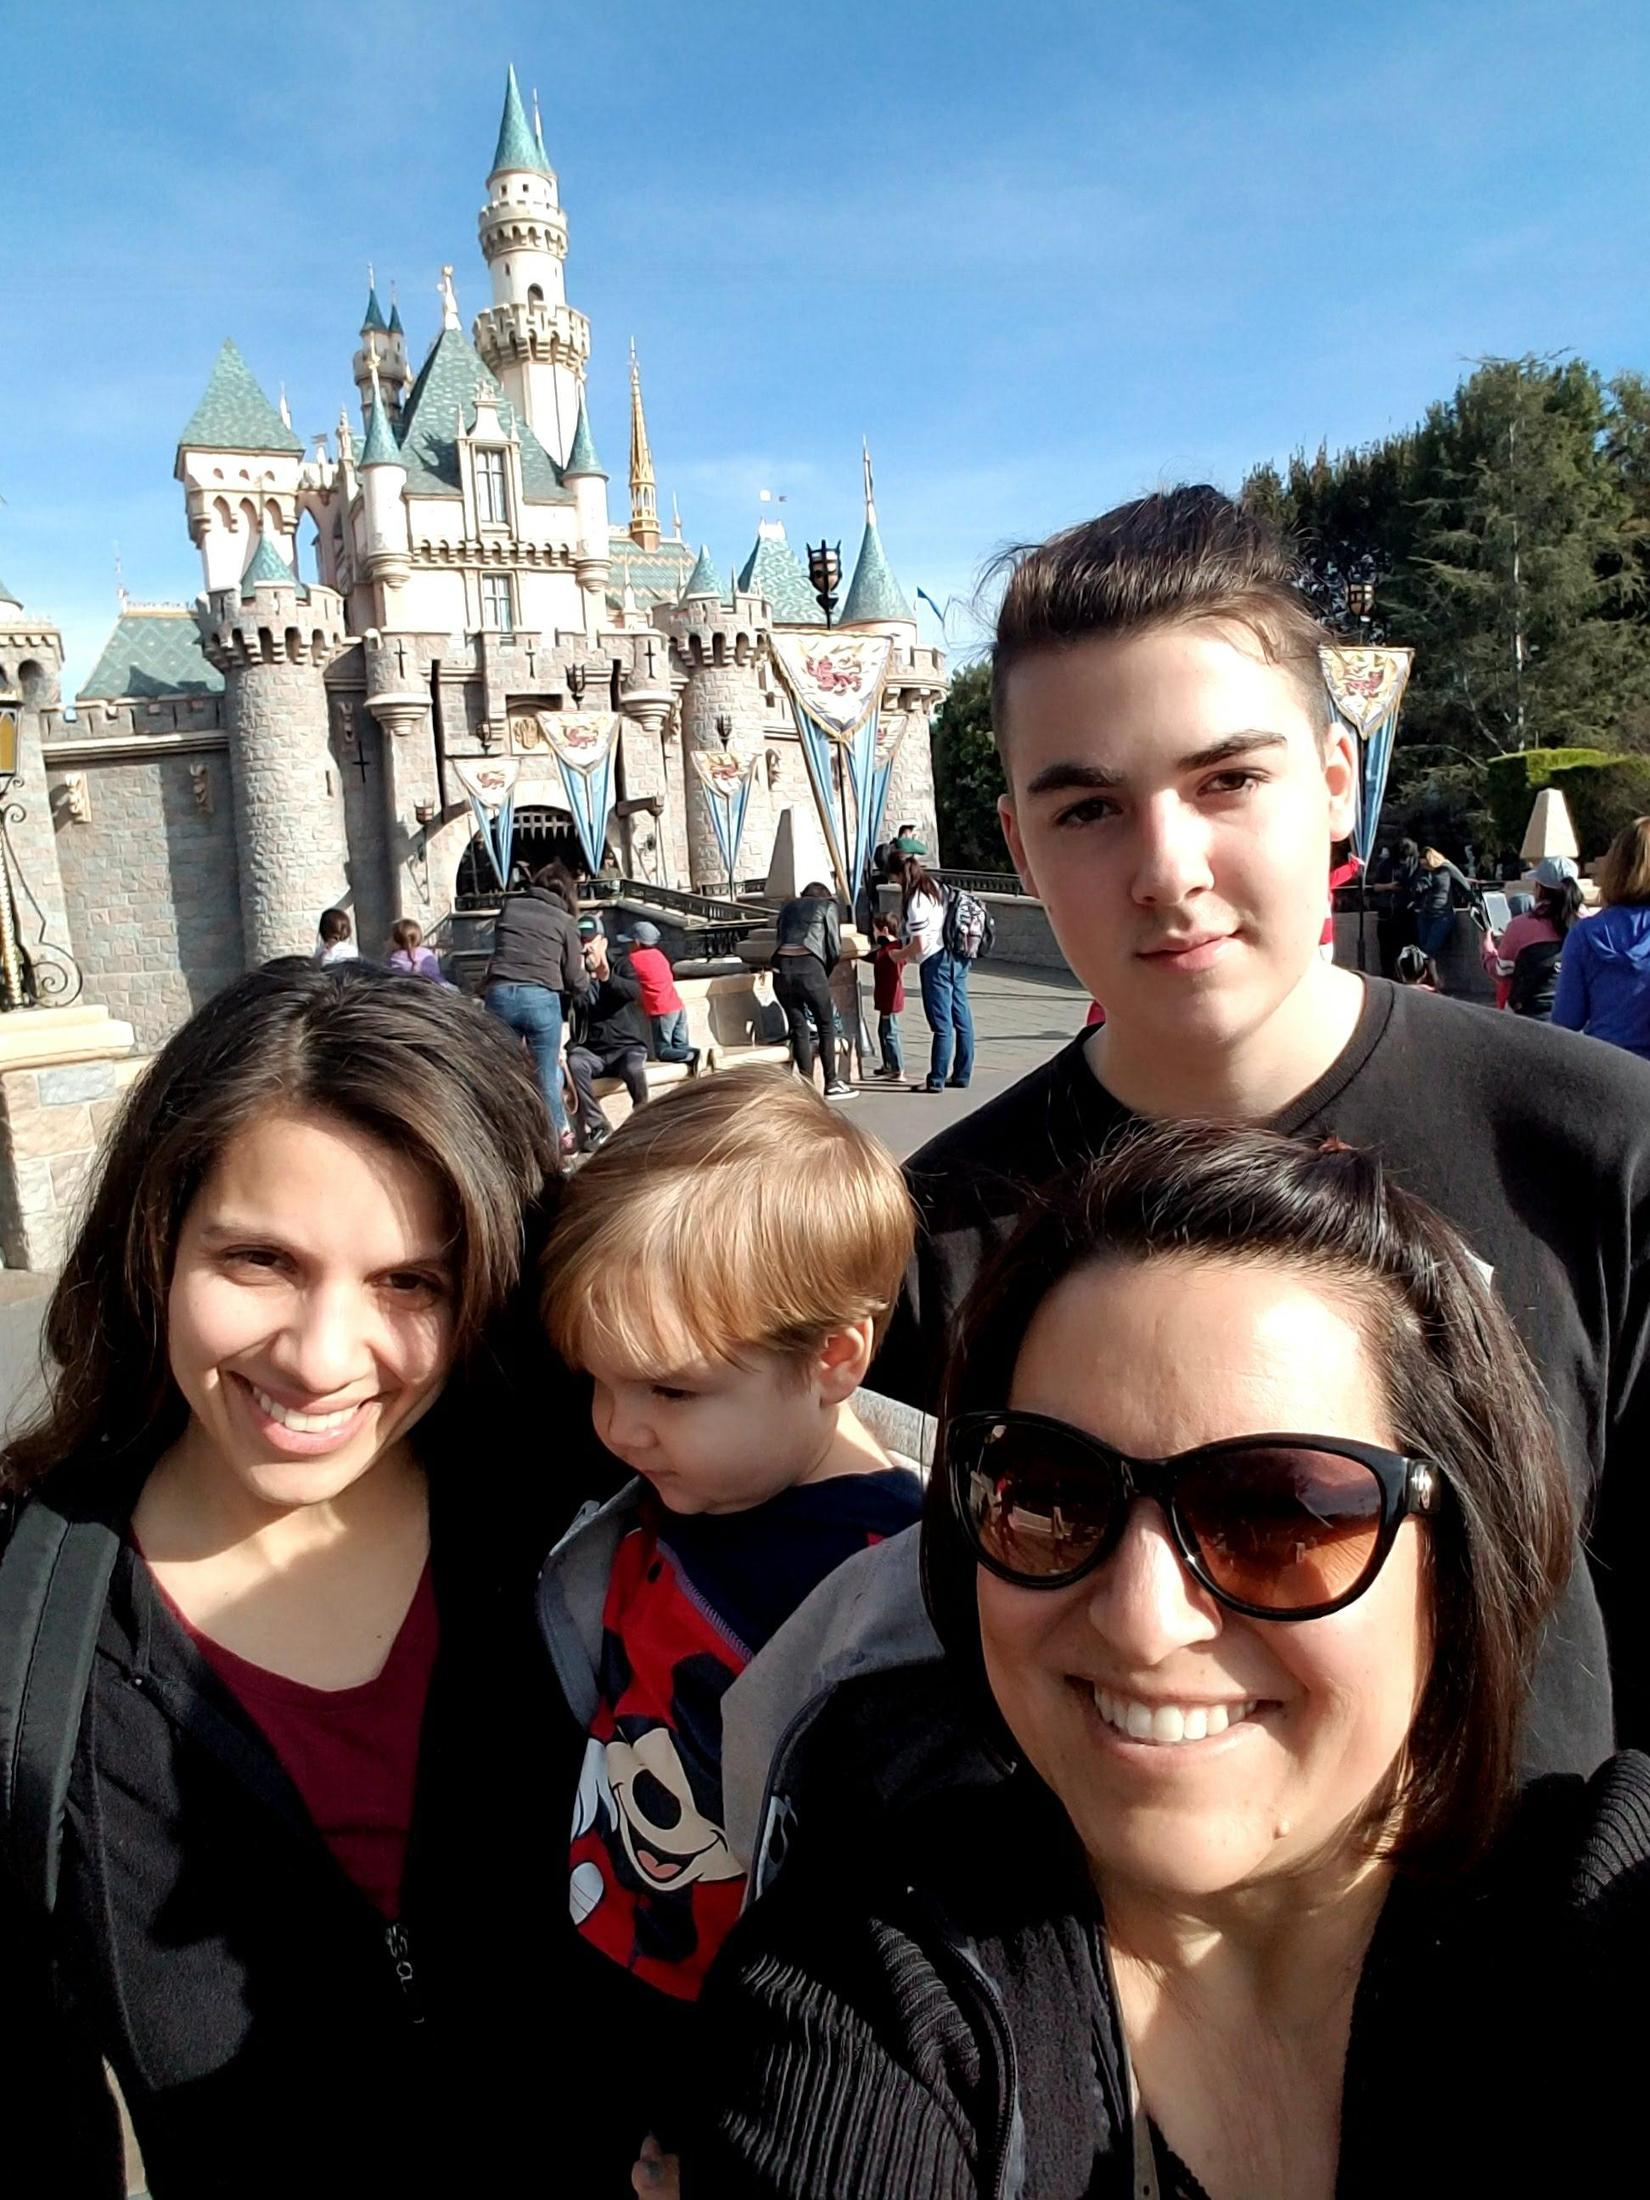 Disneyland with family